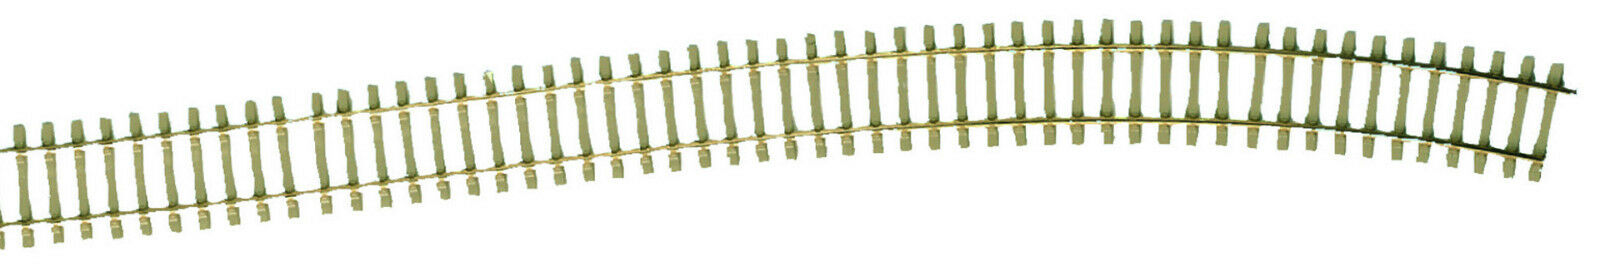 Roco H0 42401 -S Voie Flexible avec Traverses en B 65533;65533; ton 920 mm (12 enheter) -Neuf